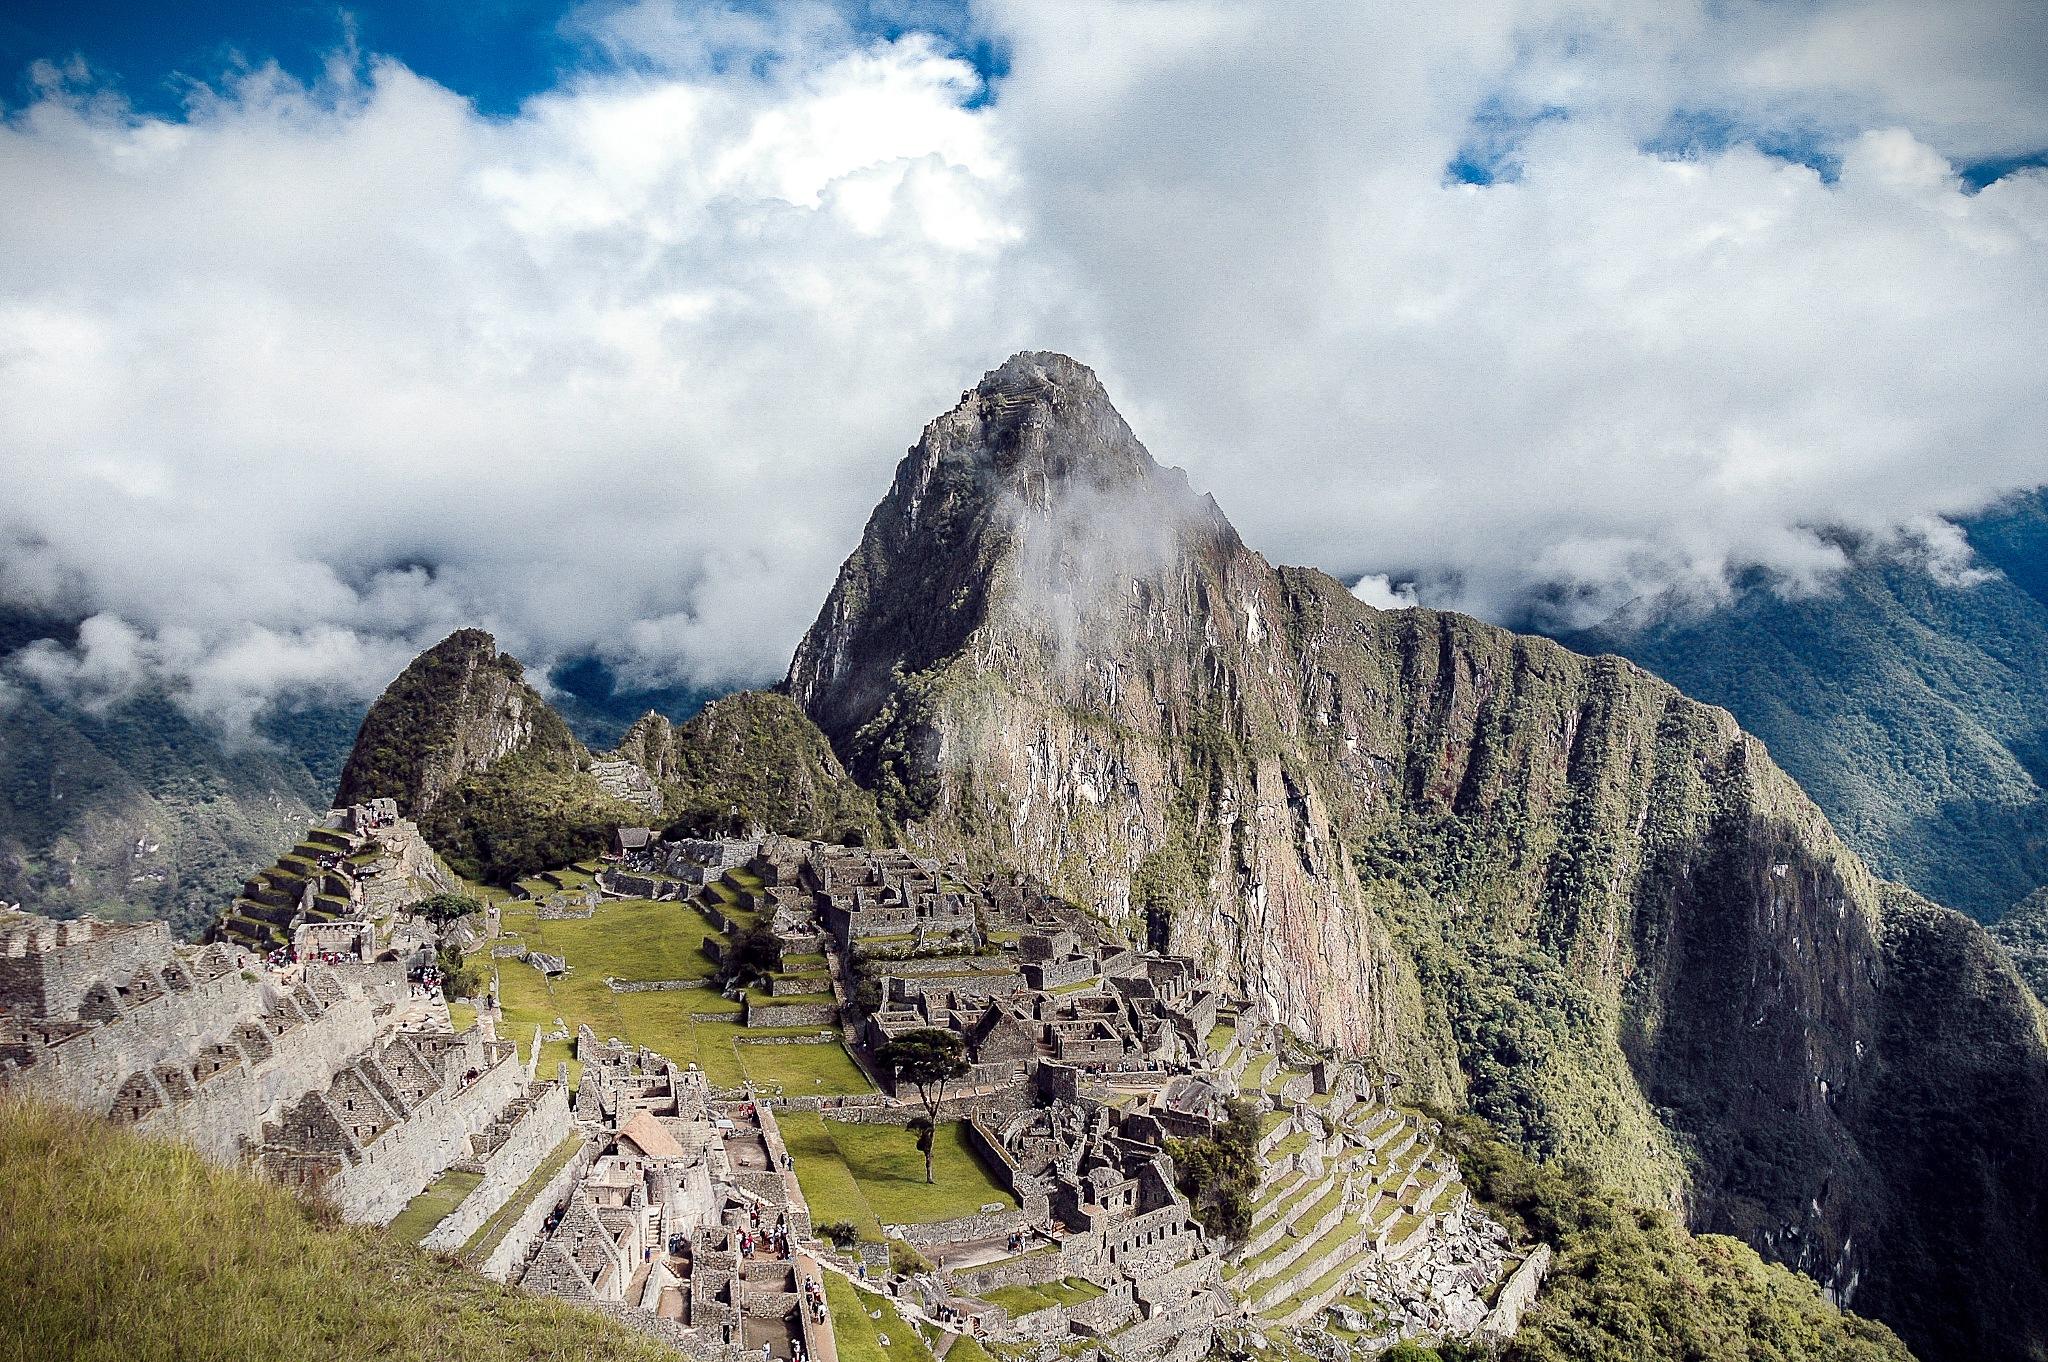 Machu Picchu by Walter Coz Farje